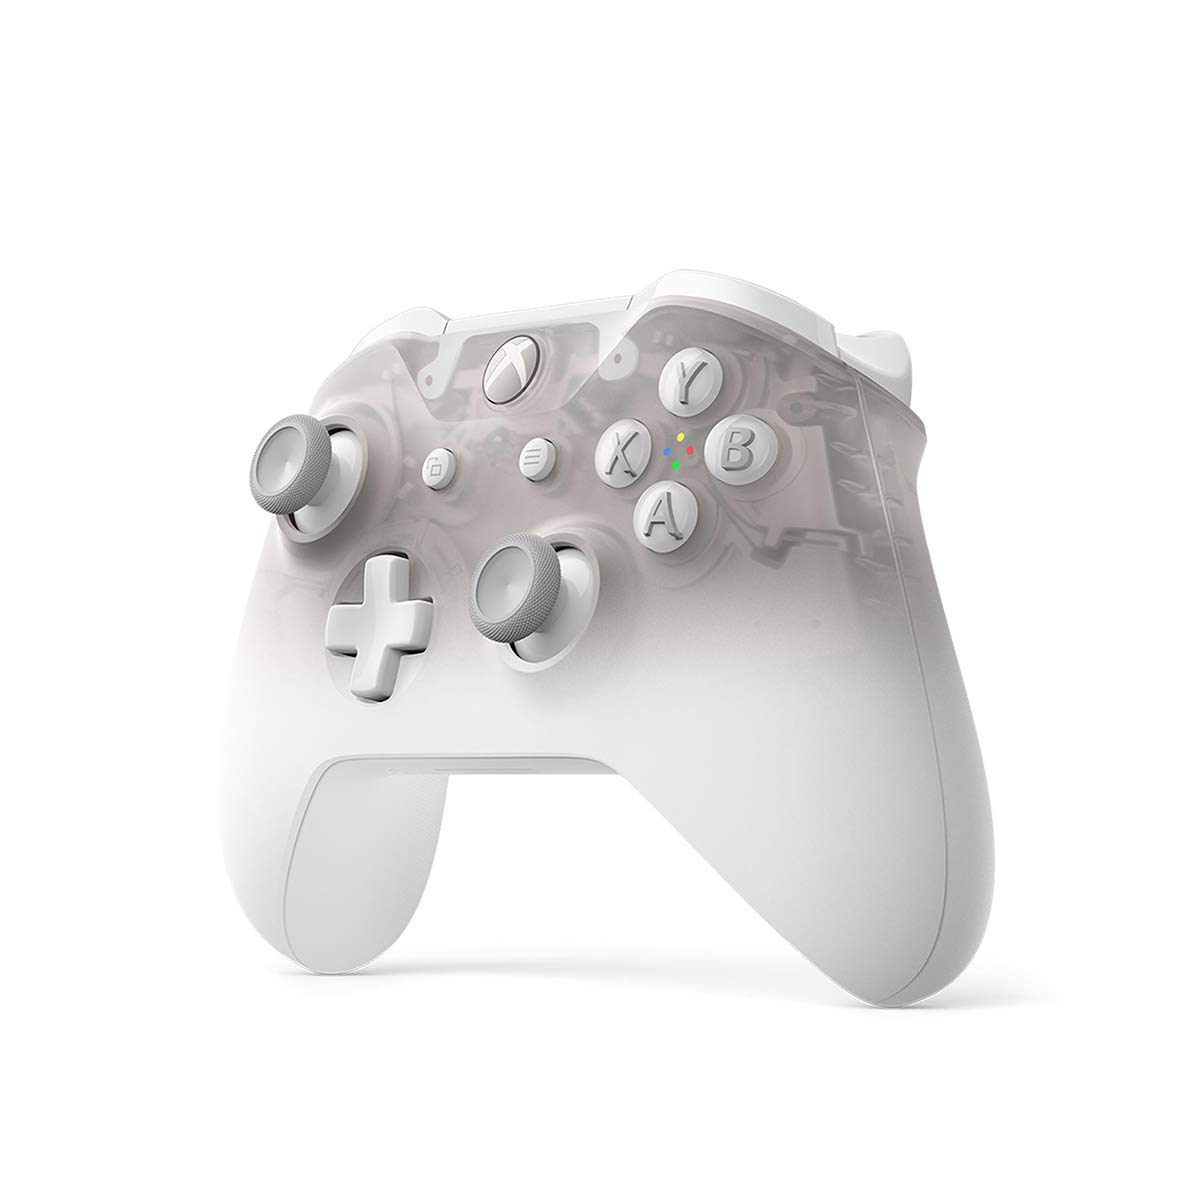 Xbox Wireless Controller - White: Video Games